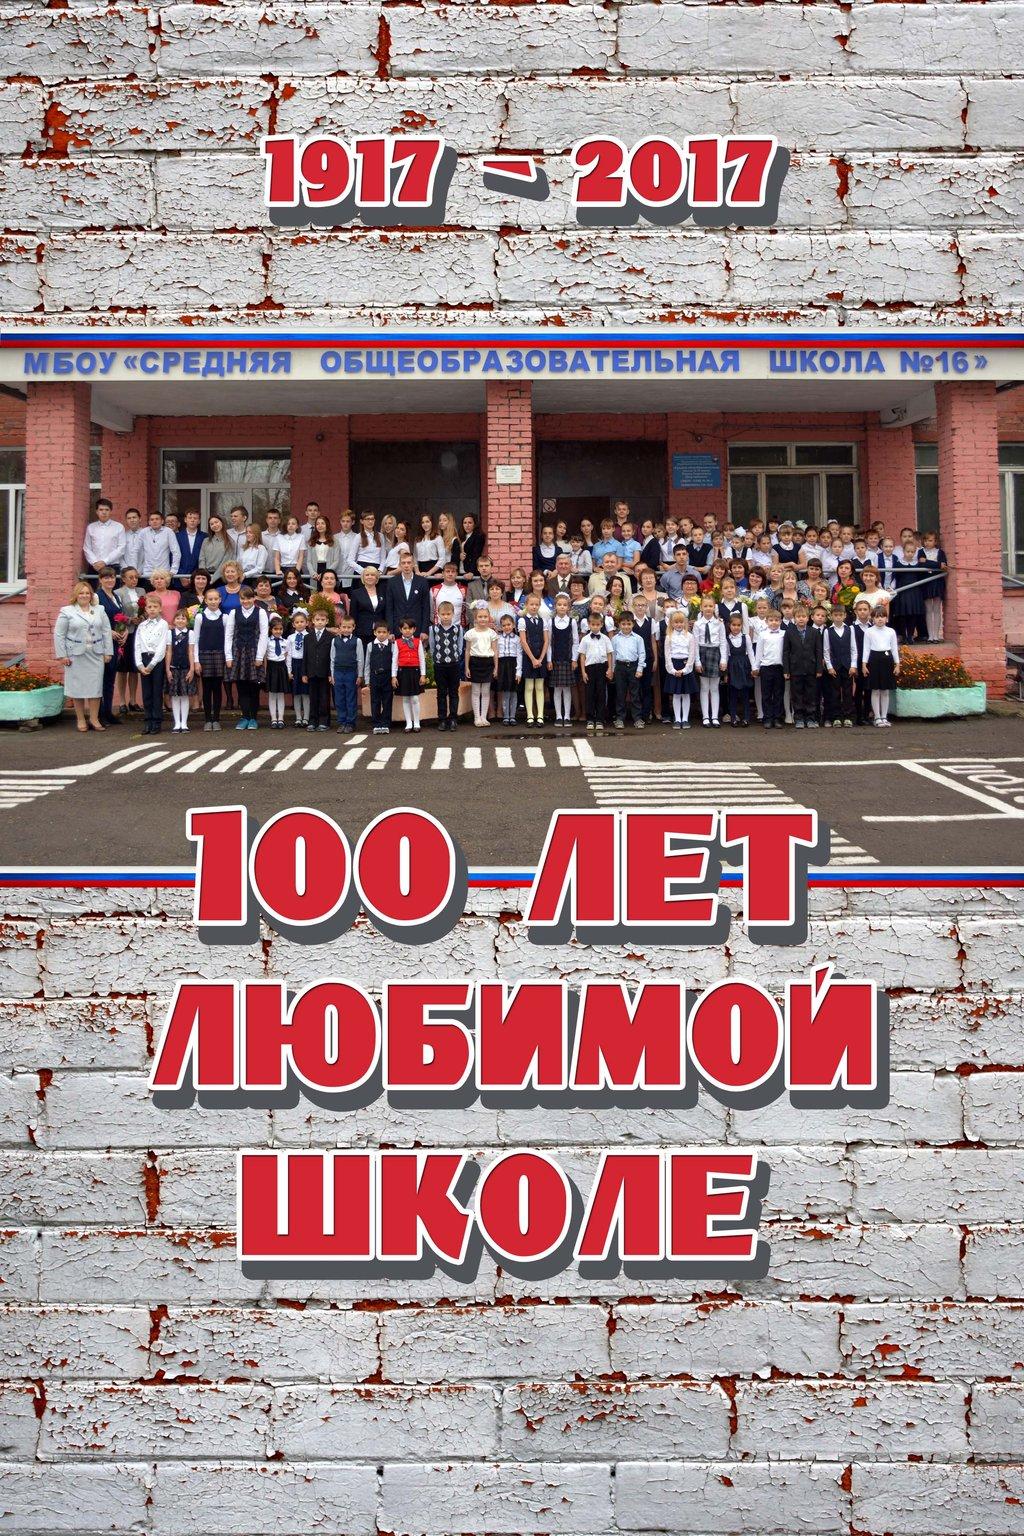 100-LET_red-white-brick